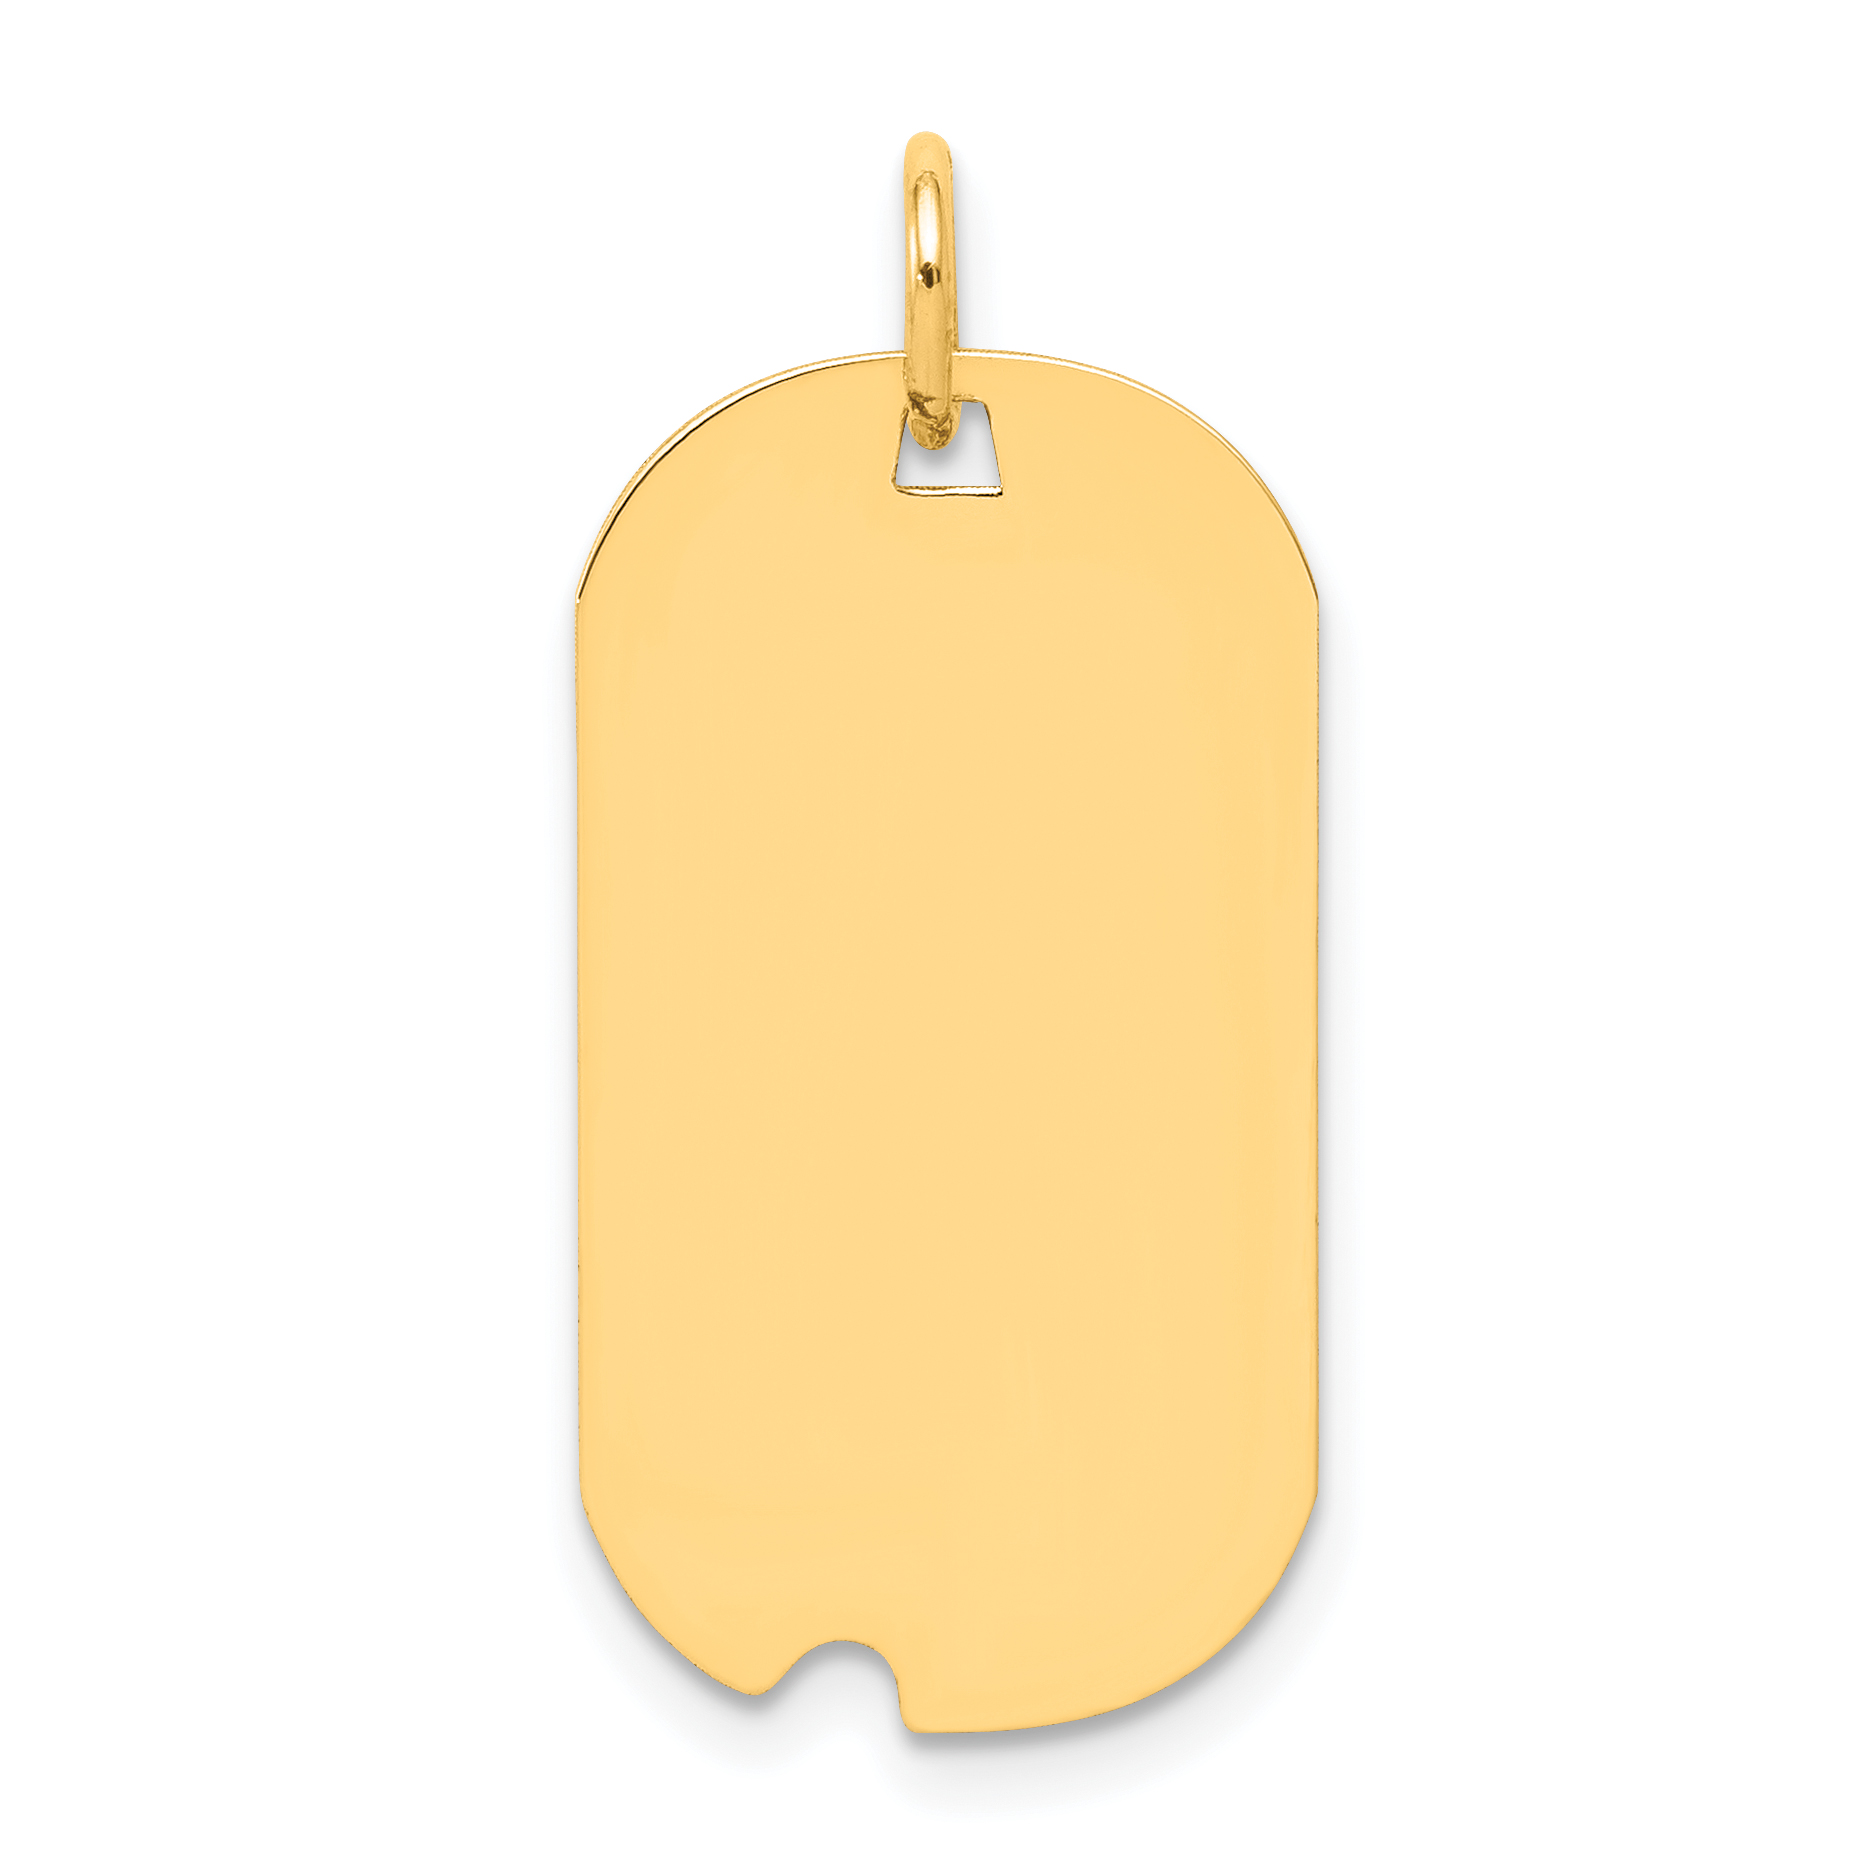 14K Yellow Gold Plain .013 Gauge Engravable Dog Tag w/Notch Disc Charm - image 2 of 2